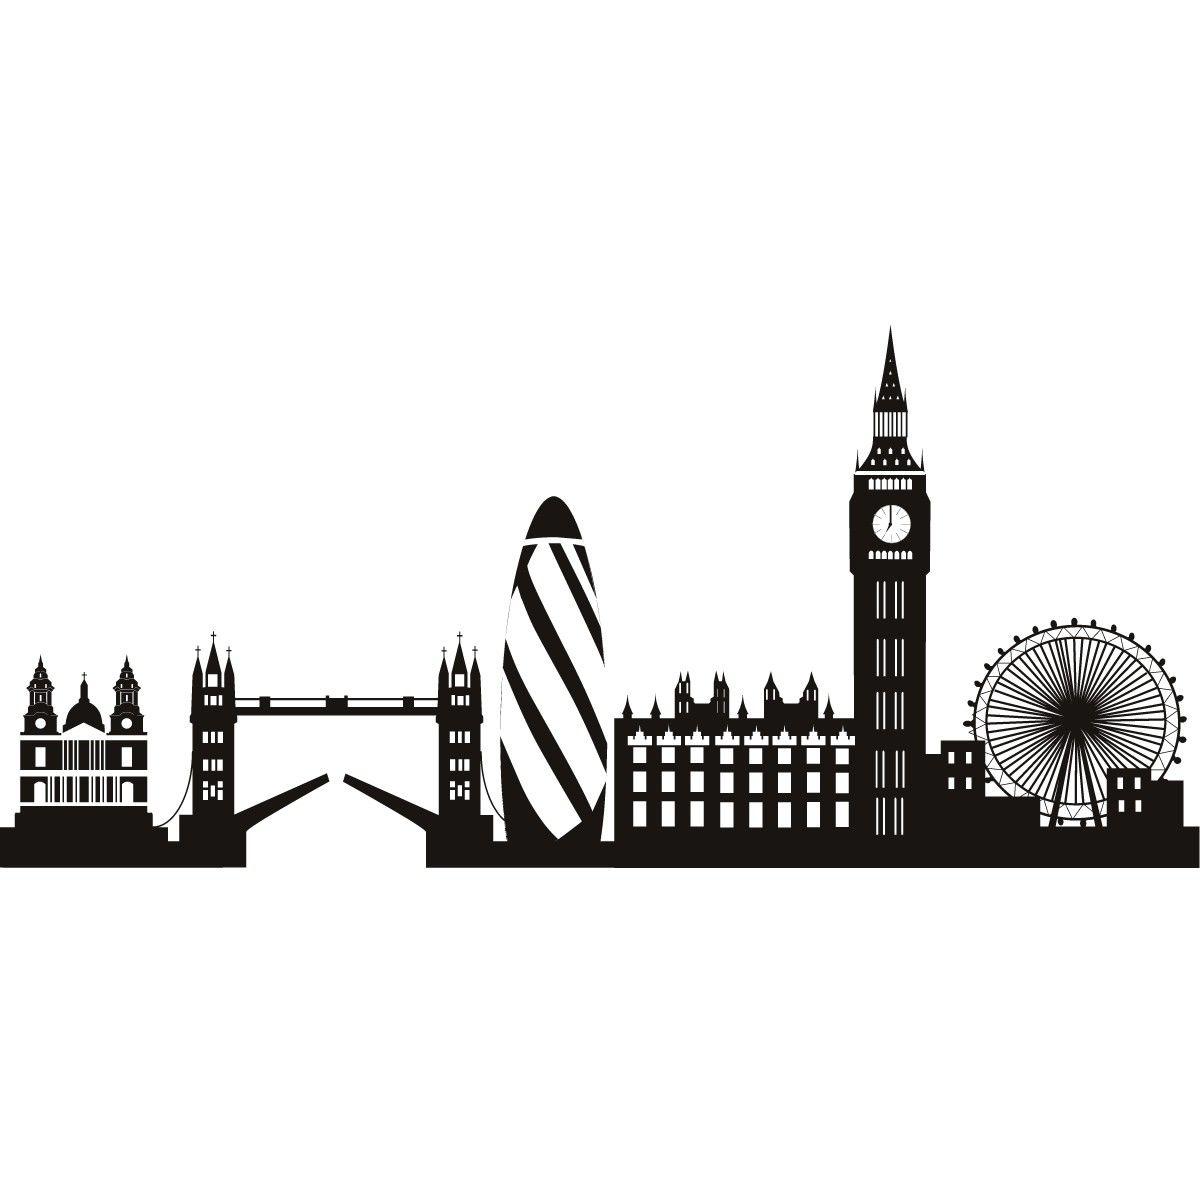 Line Drawing Tattoo London : London skyline decorative wall art stickers decal all